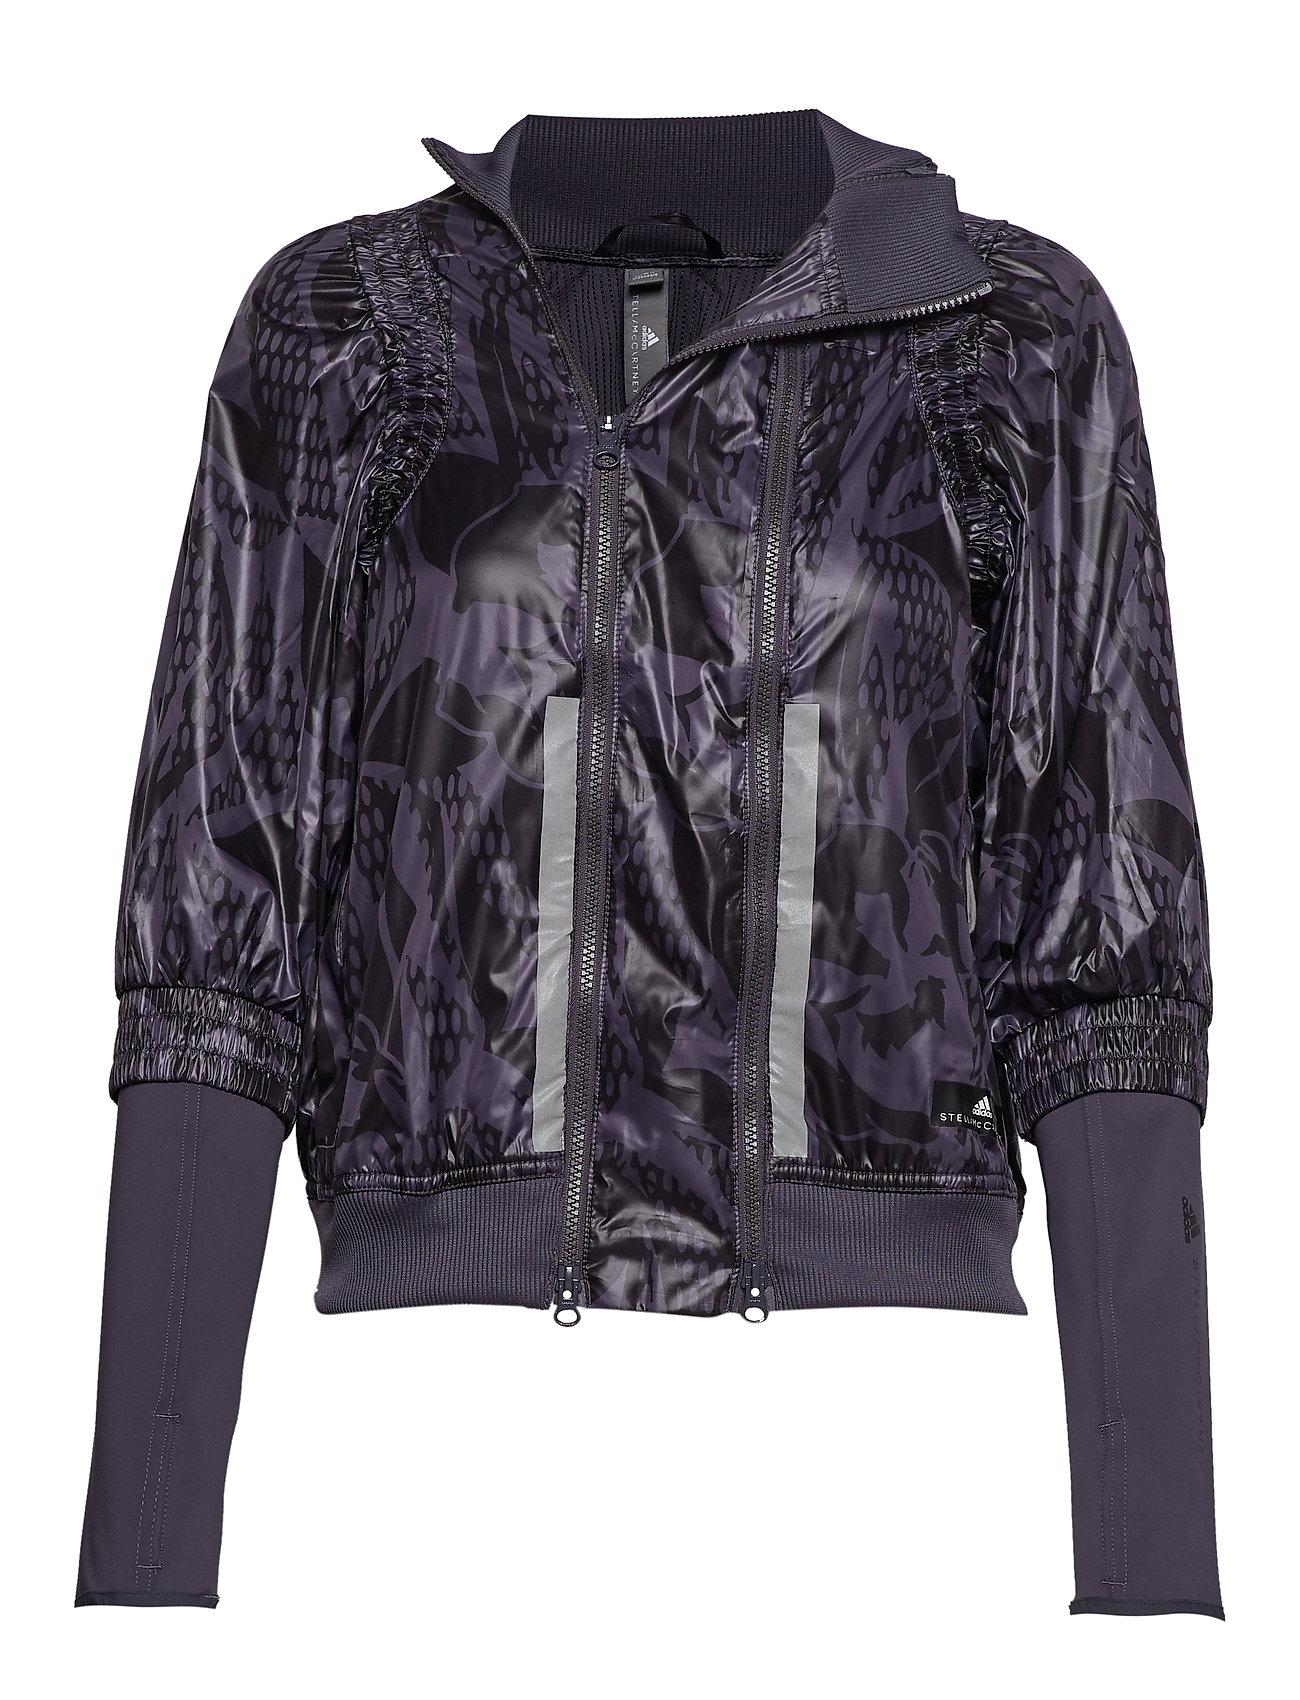 adidas by Stella McCartney RUN JACKET - NGTSTE/BLACK